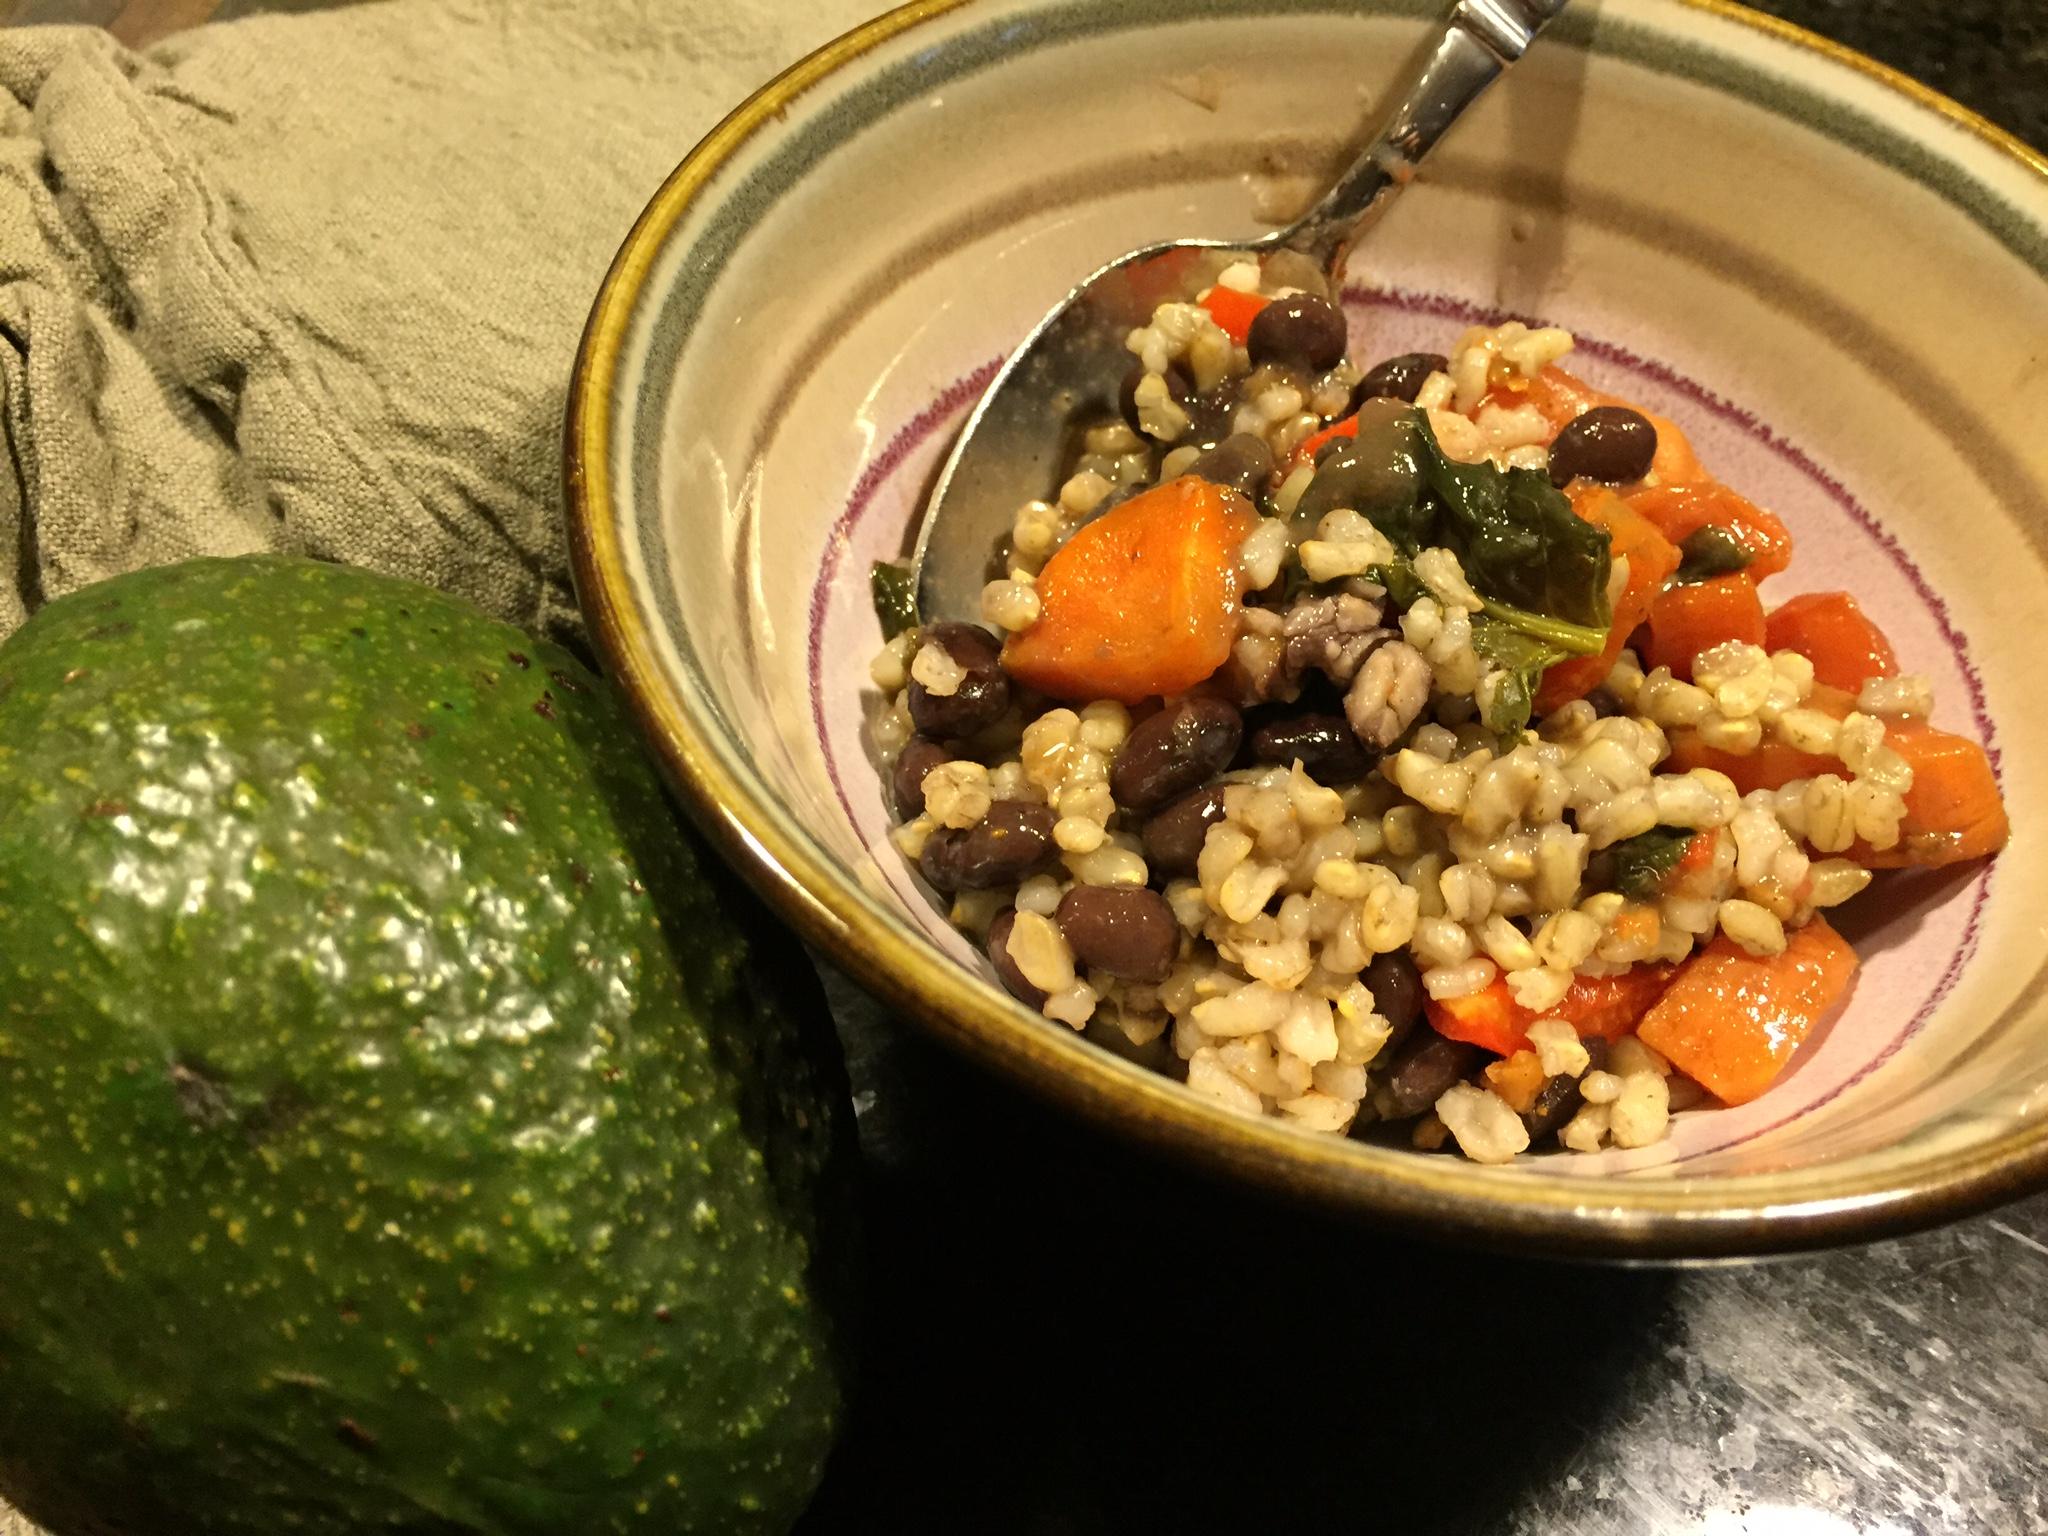 vegan gluten-free recipe